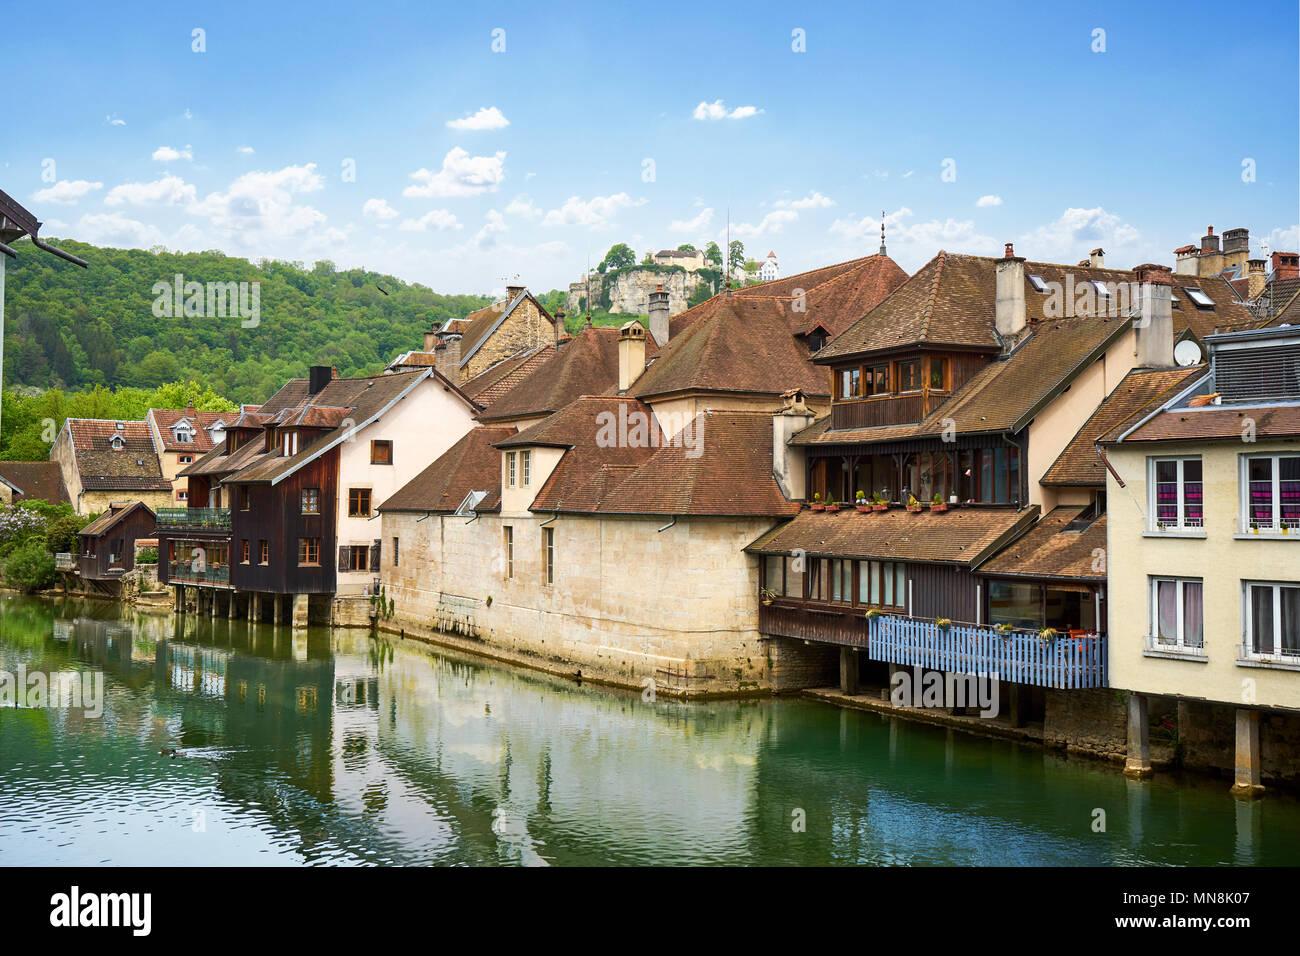 Ornans Cityscape Aside Loue River - Doubs - France - Stock Image